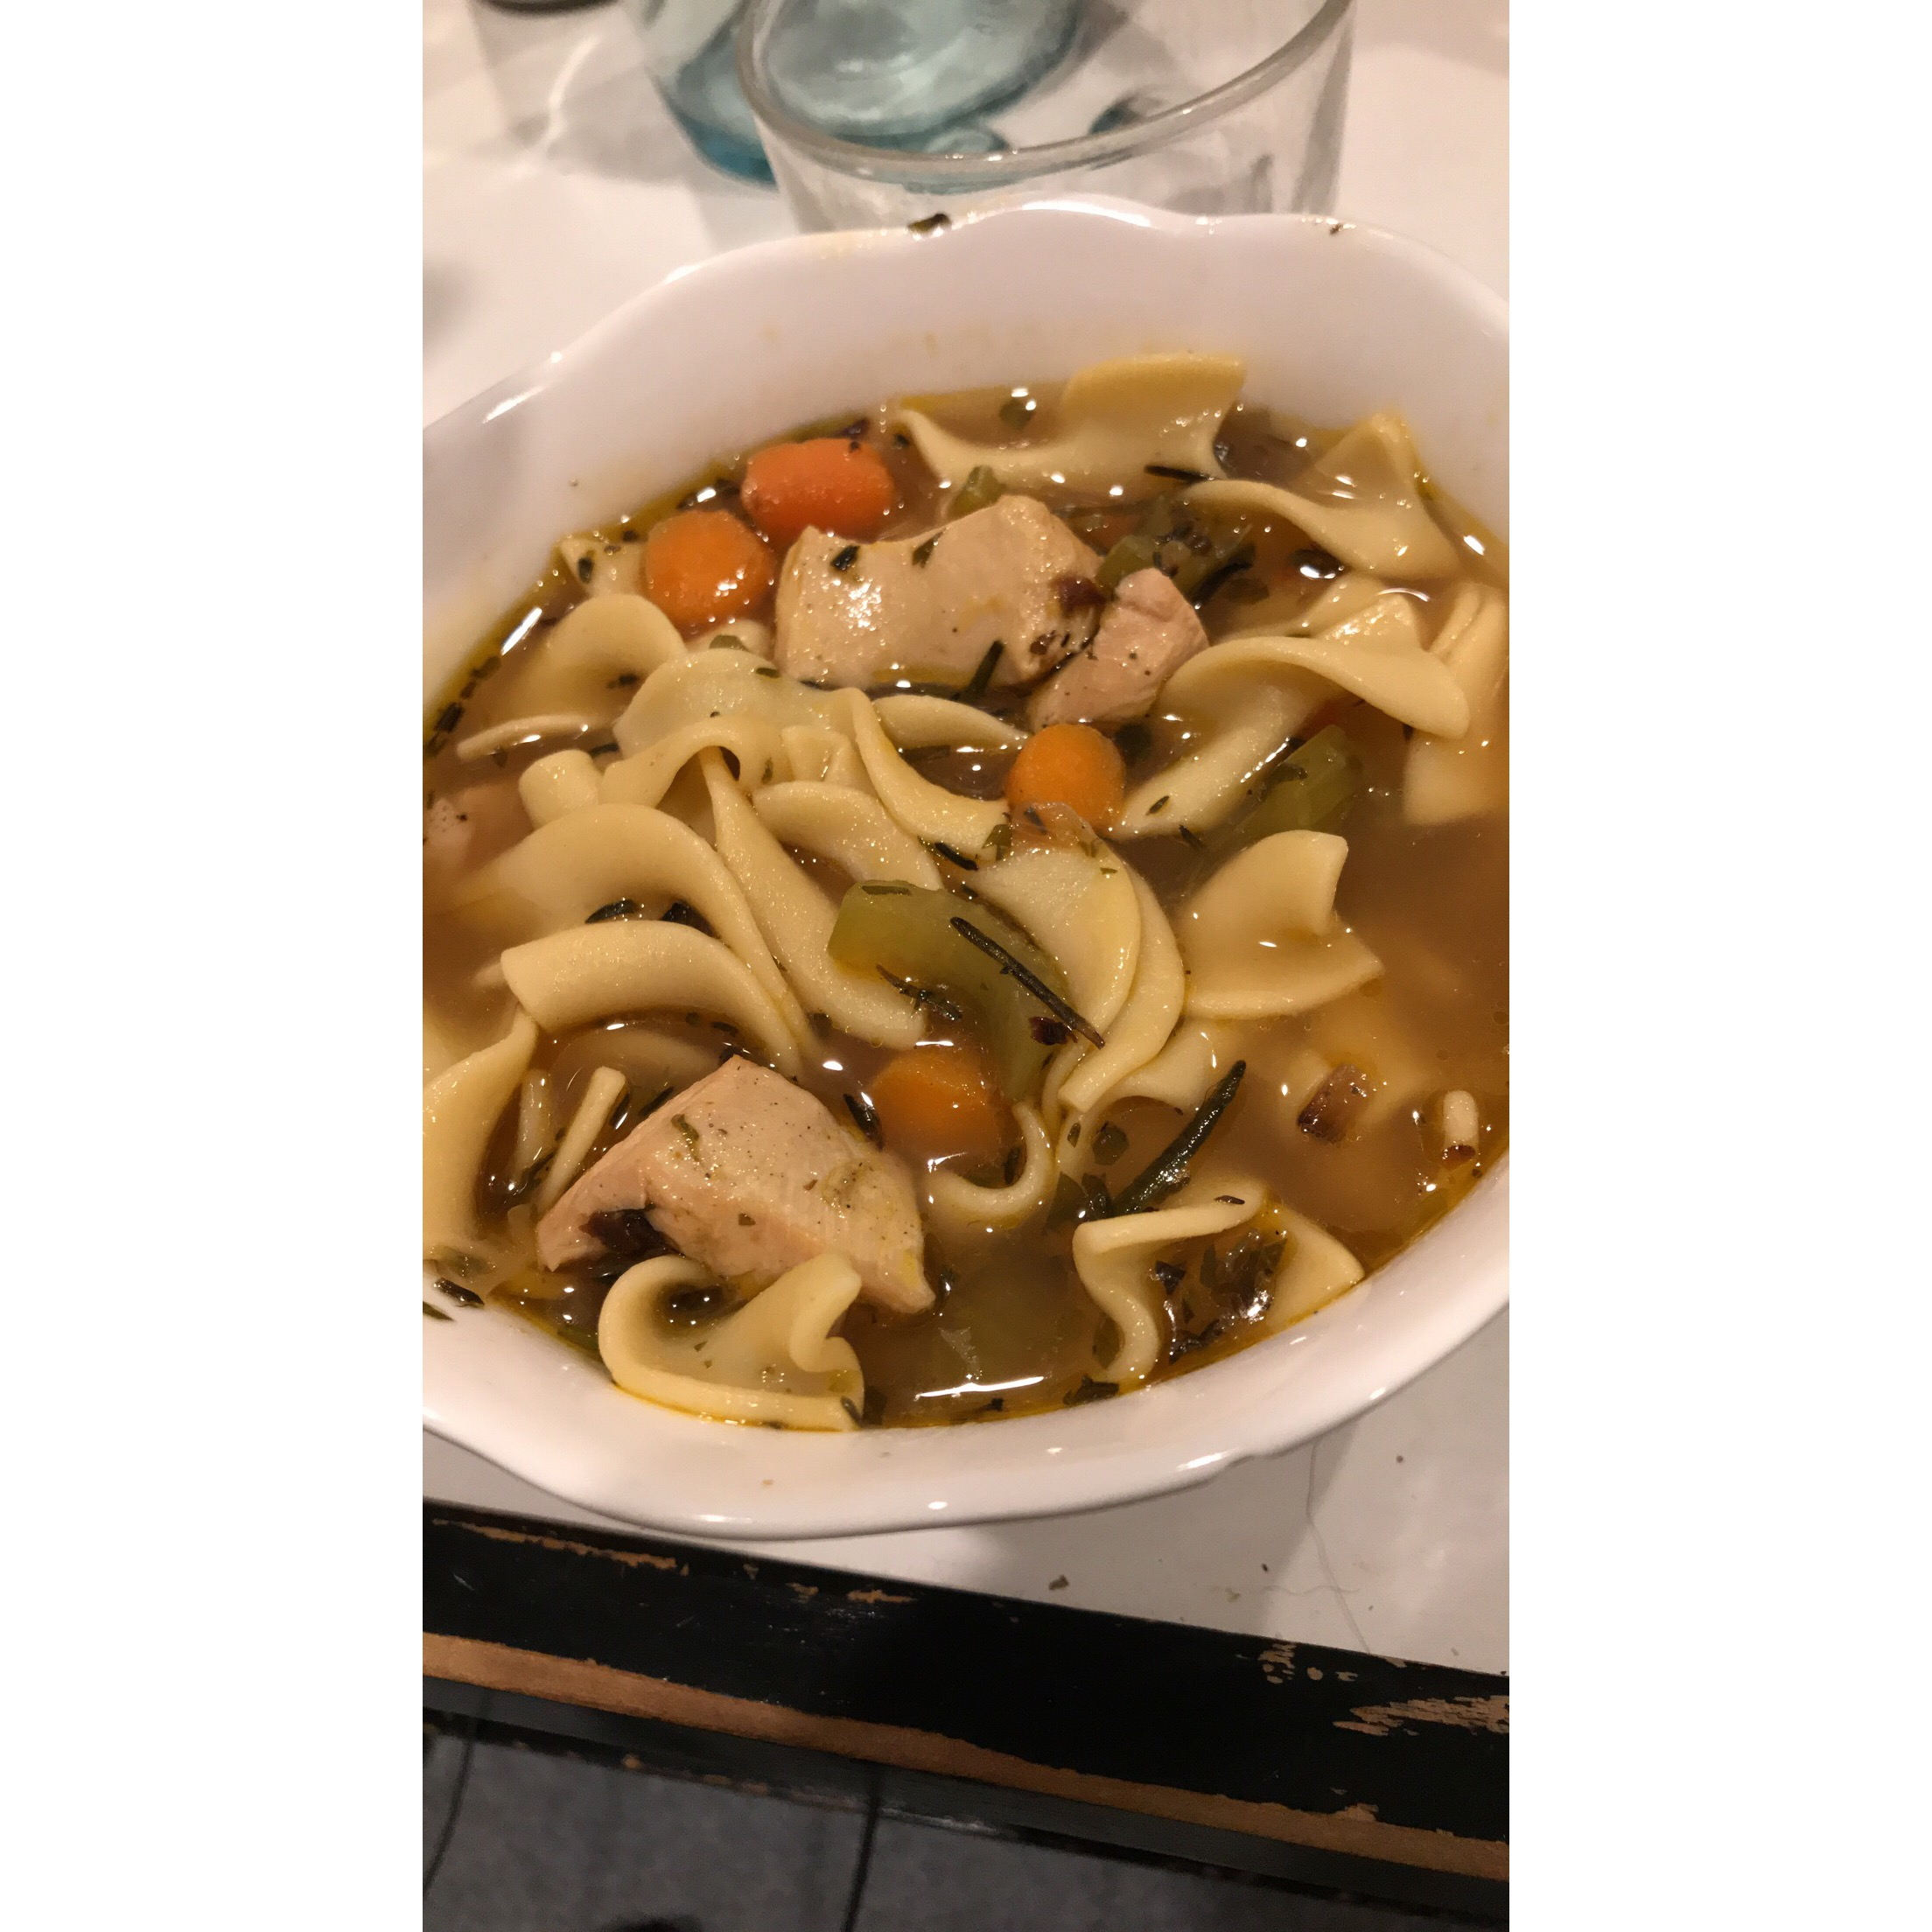 Steve's Chicken Noodle Soup Briana McDermott